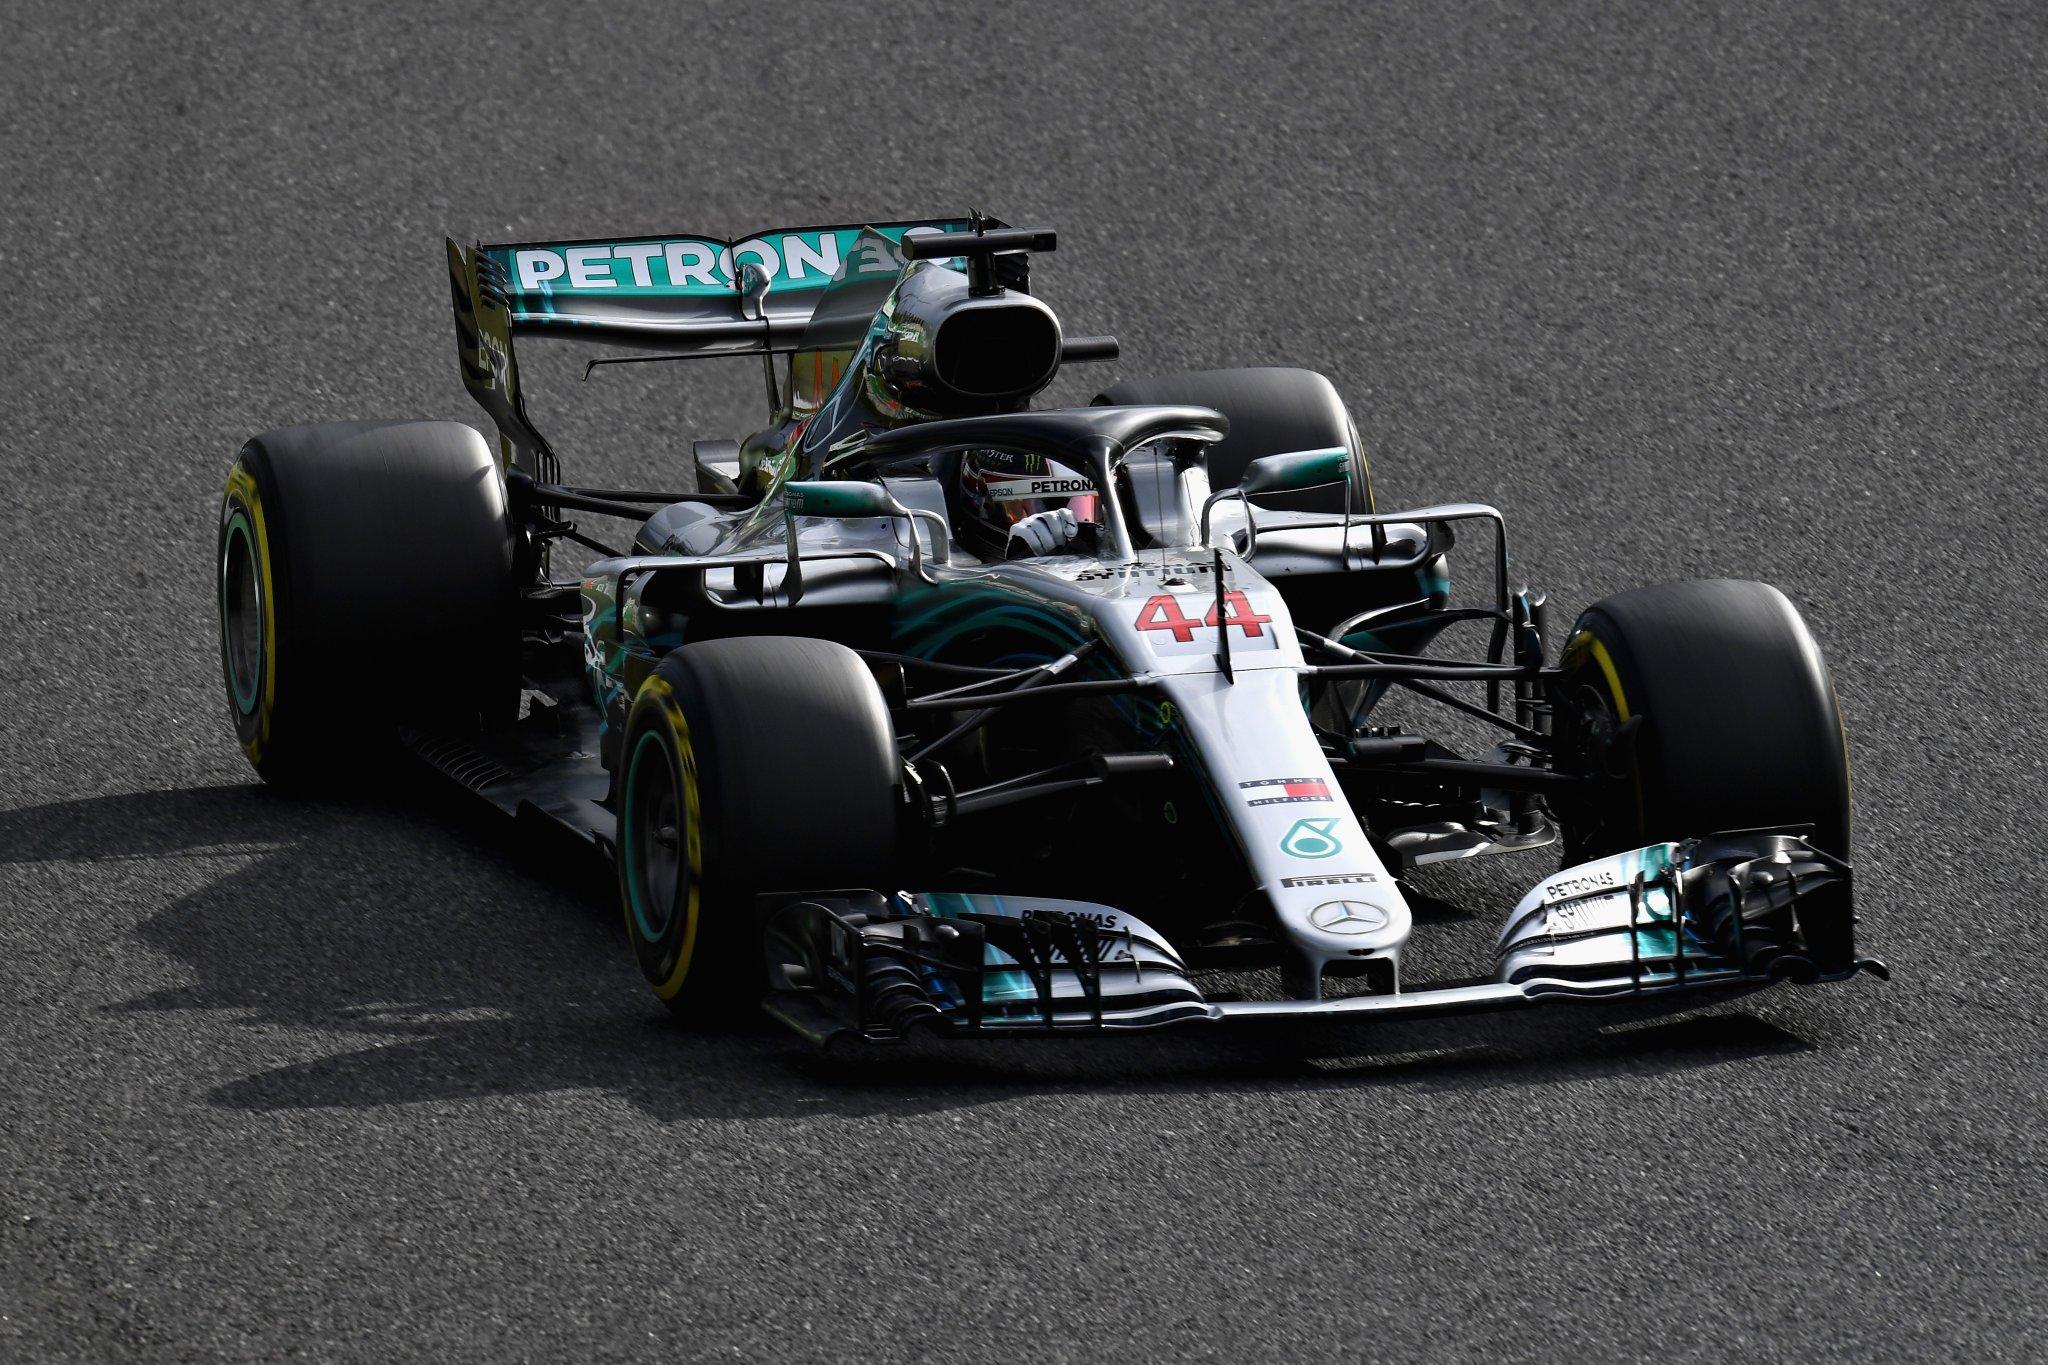 Suzuka Qualifications : Hamilton émerge, Vettel prend l'eau